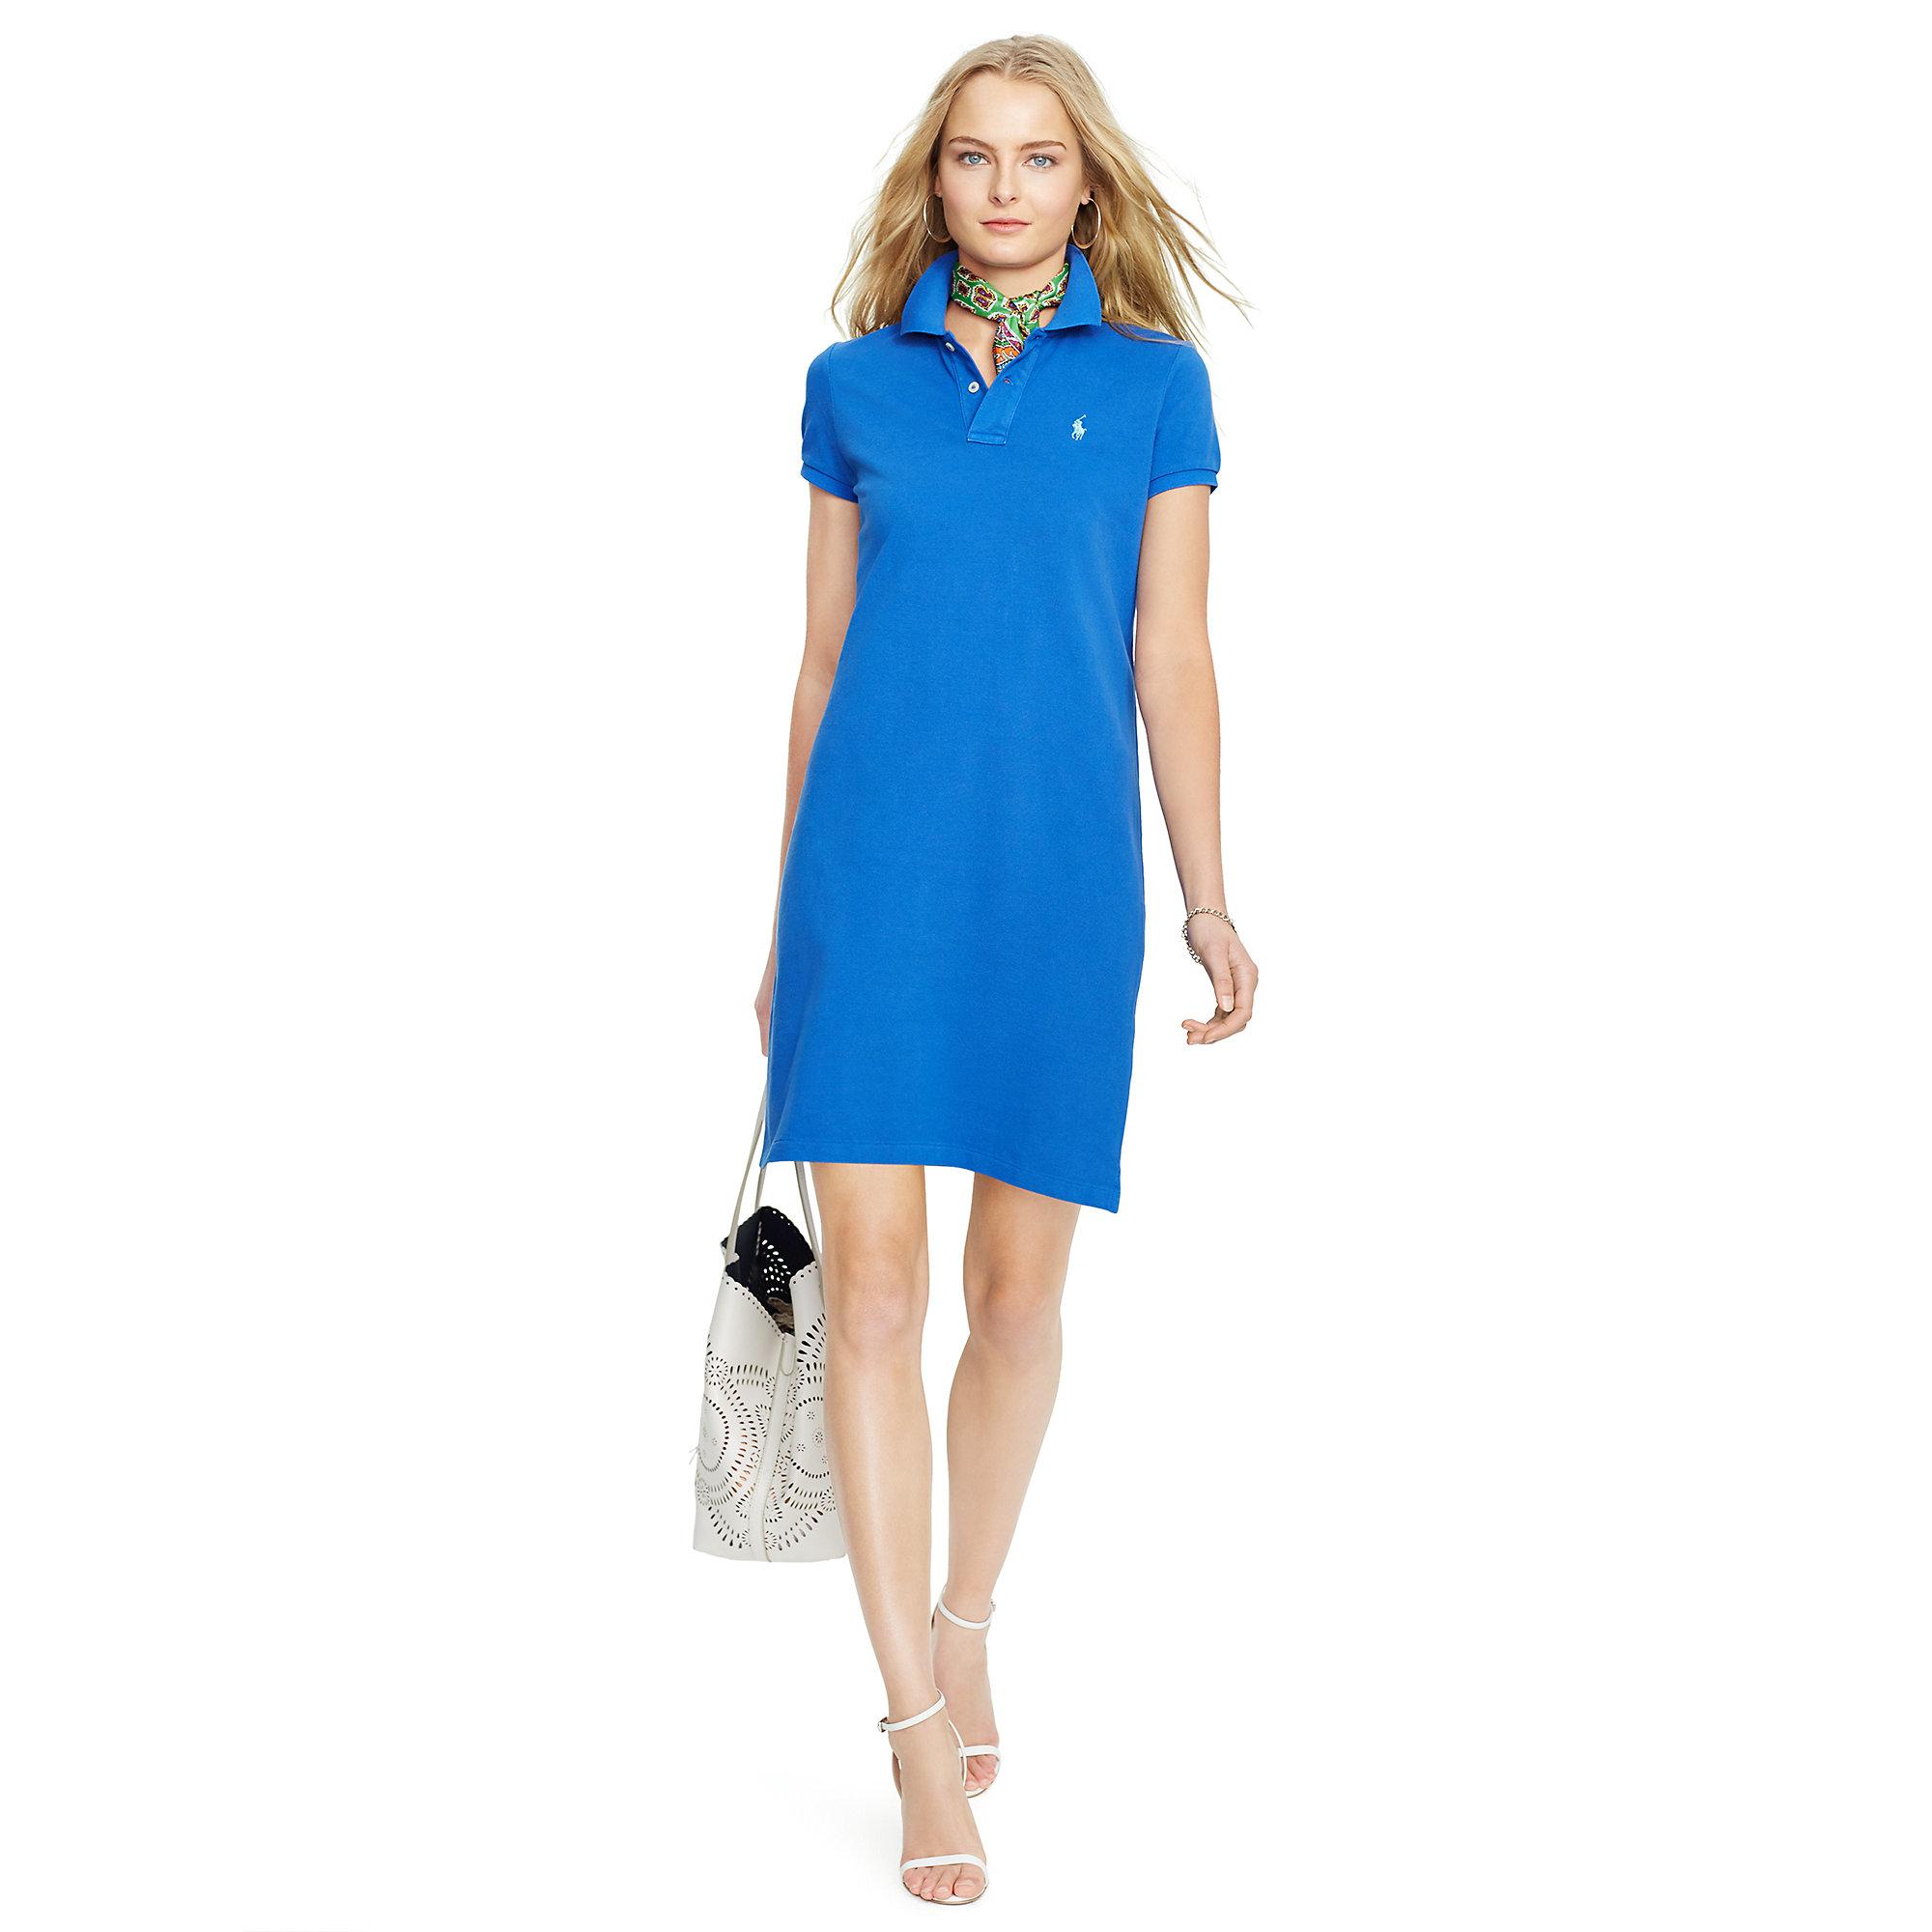 331bab6eefb7a Lyst - Polo Ralph Lauren Cotton Mesh Polo Dress in Blue